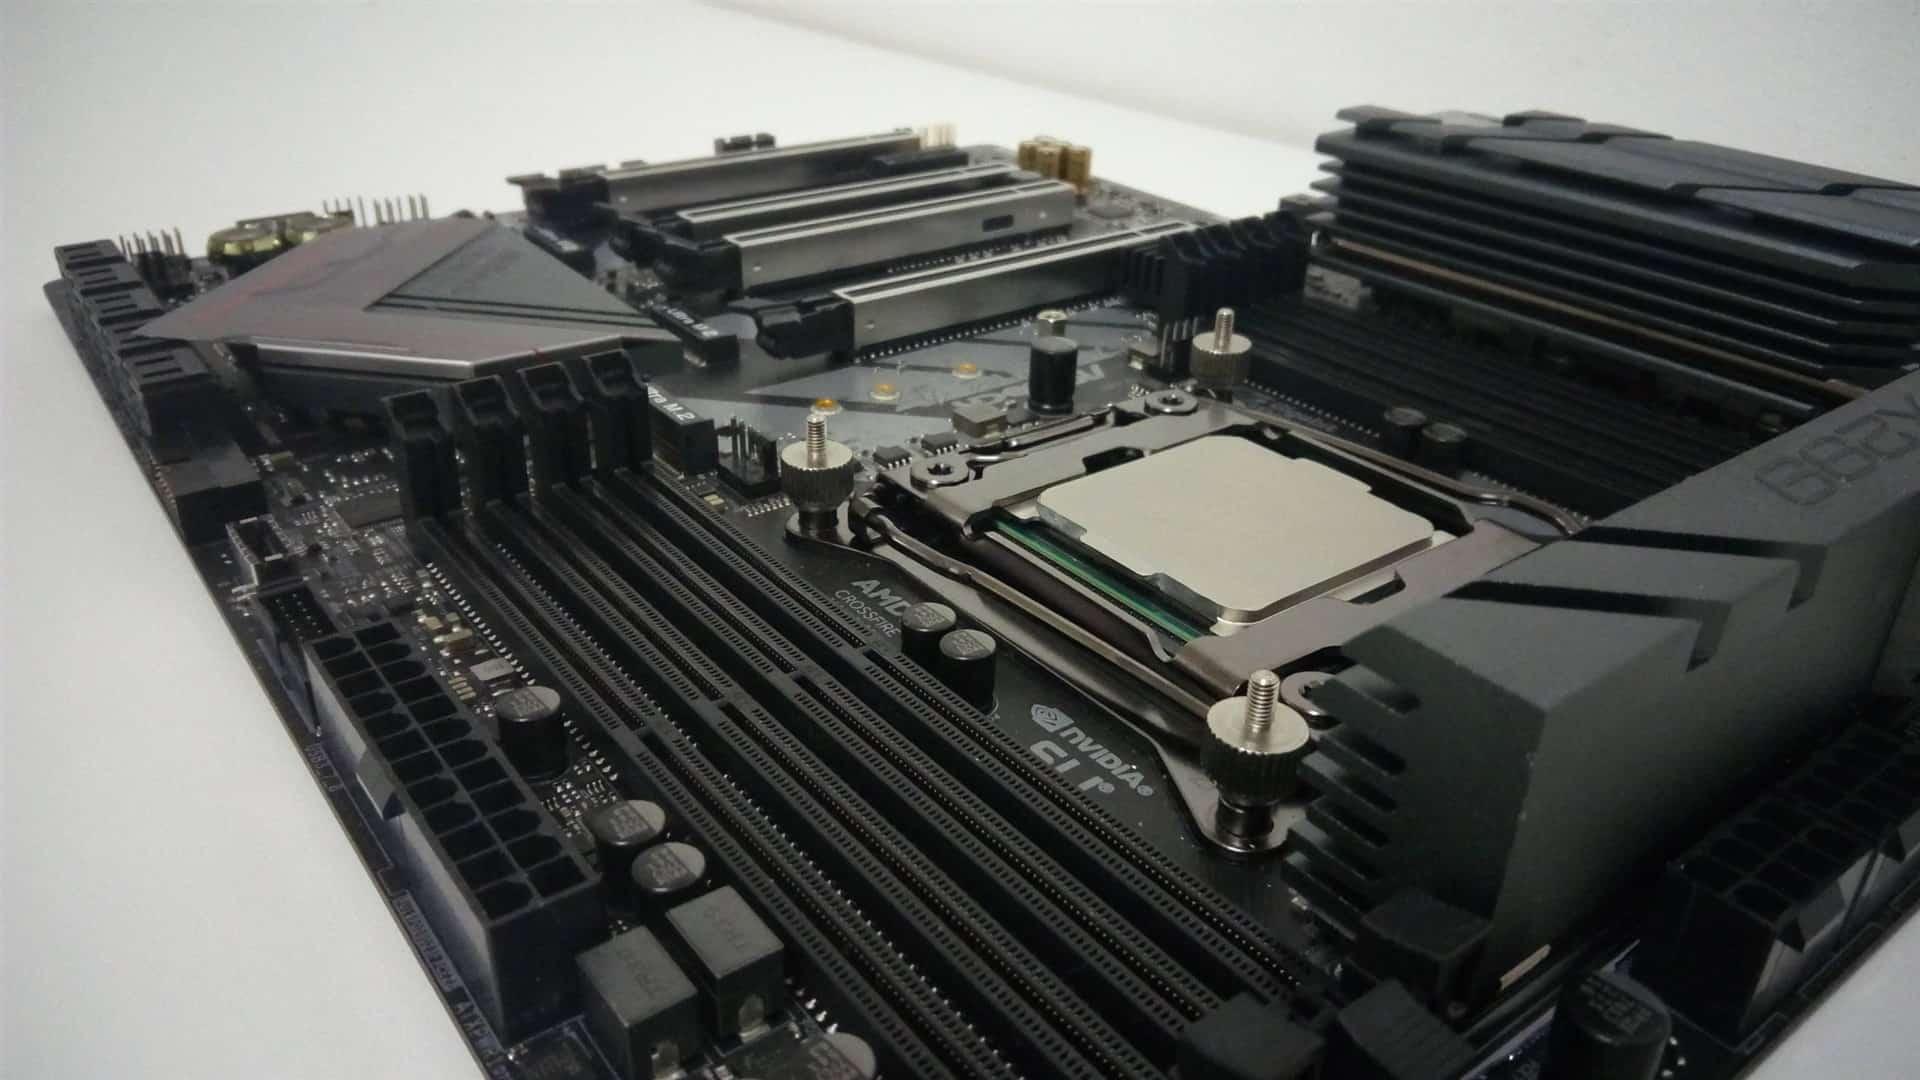 ASRock Fatal1ty X299 Pro Gaming i9 XE SLOT RAM - ASRock Fatal1ty X299 Pro Gaming i9 XE Recensione